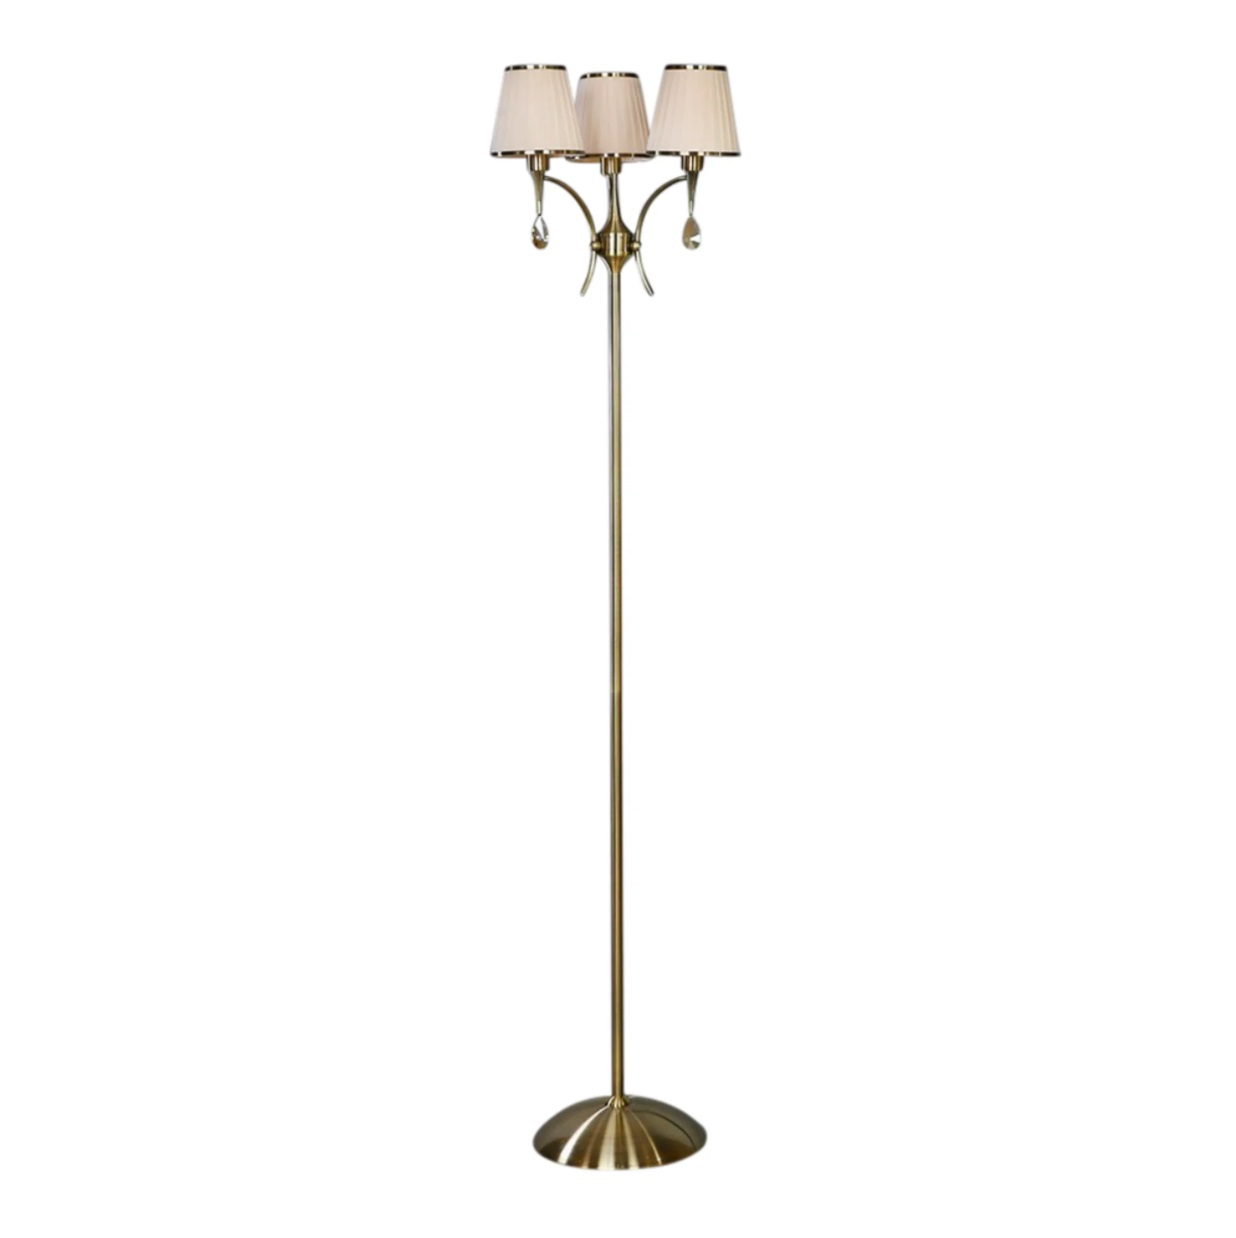 Торшер Brizzi ma 01625f/003 bronze cream настольная лампа brizzi ma 01625t 001 bronze cream